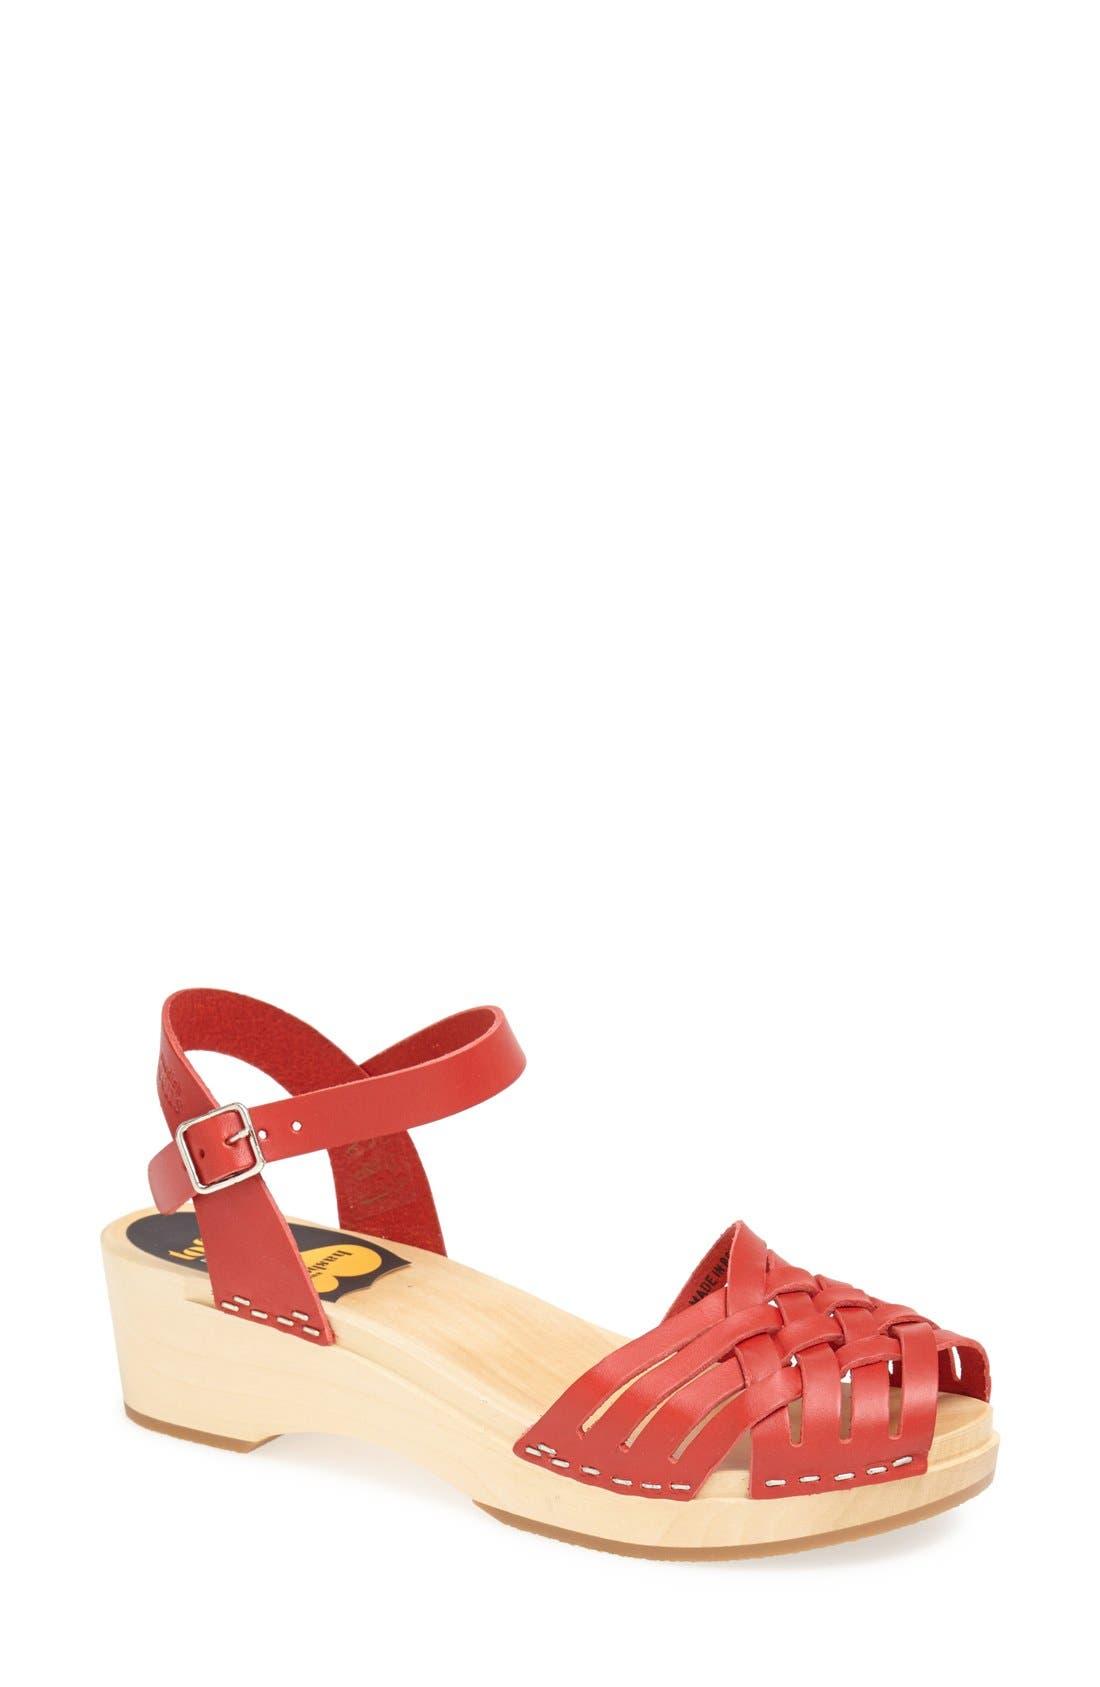 Alternate Image 1 Selected - Swedish Hasbeens Braided Sandal